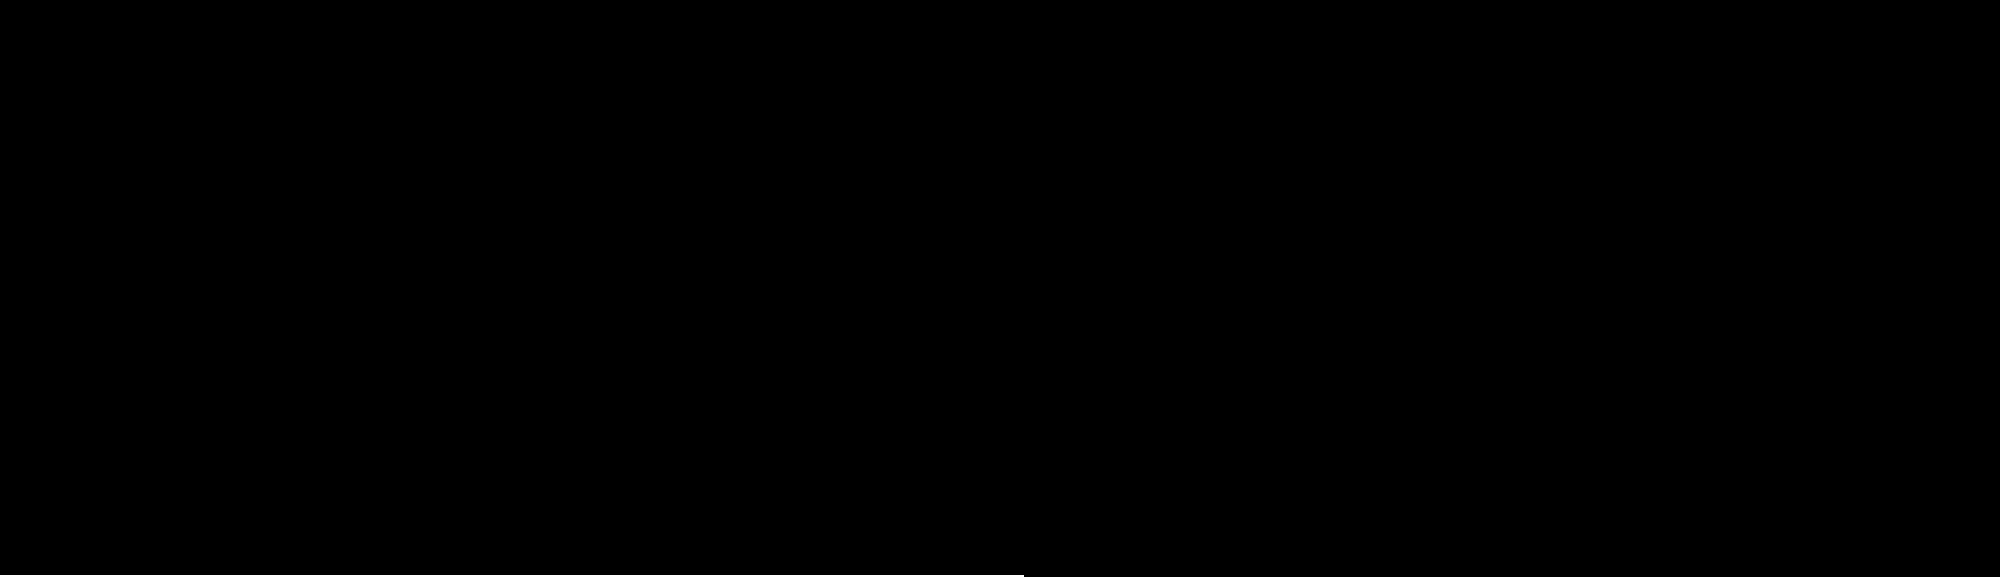 scientific-american-logo.png